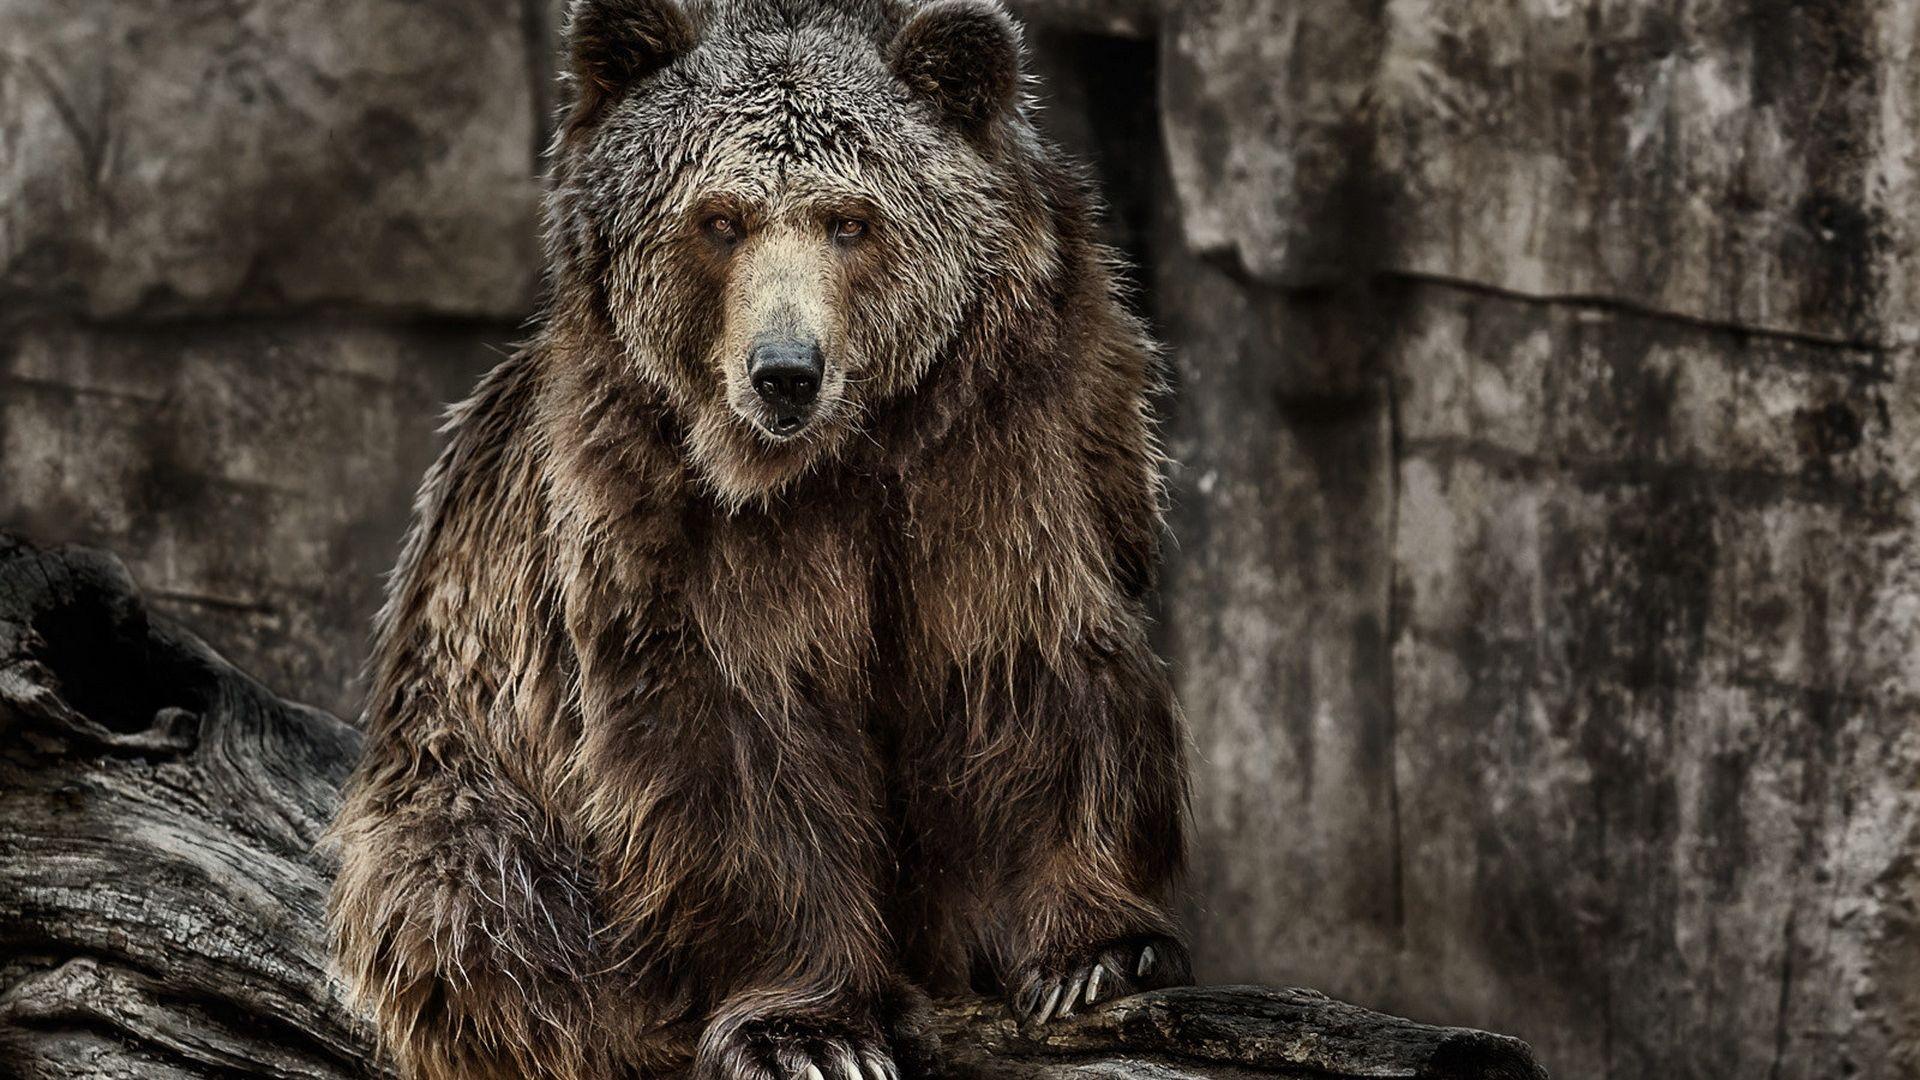 Wallpaper Bear, predator, wild animal, furry animals